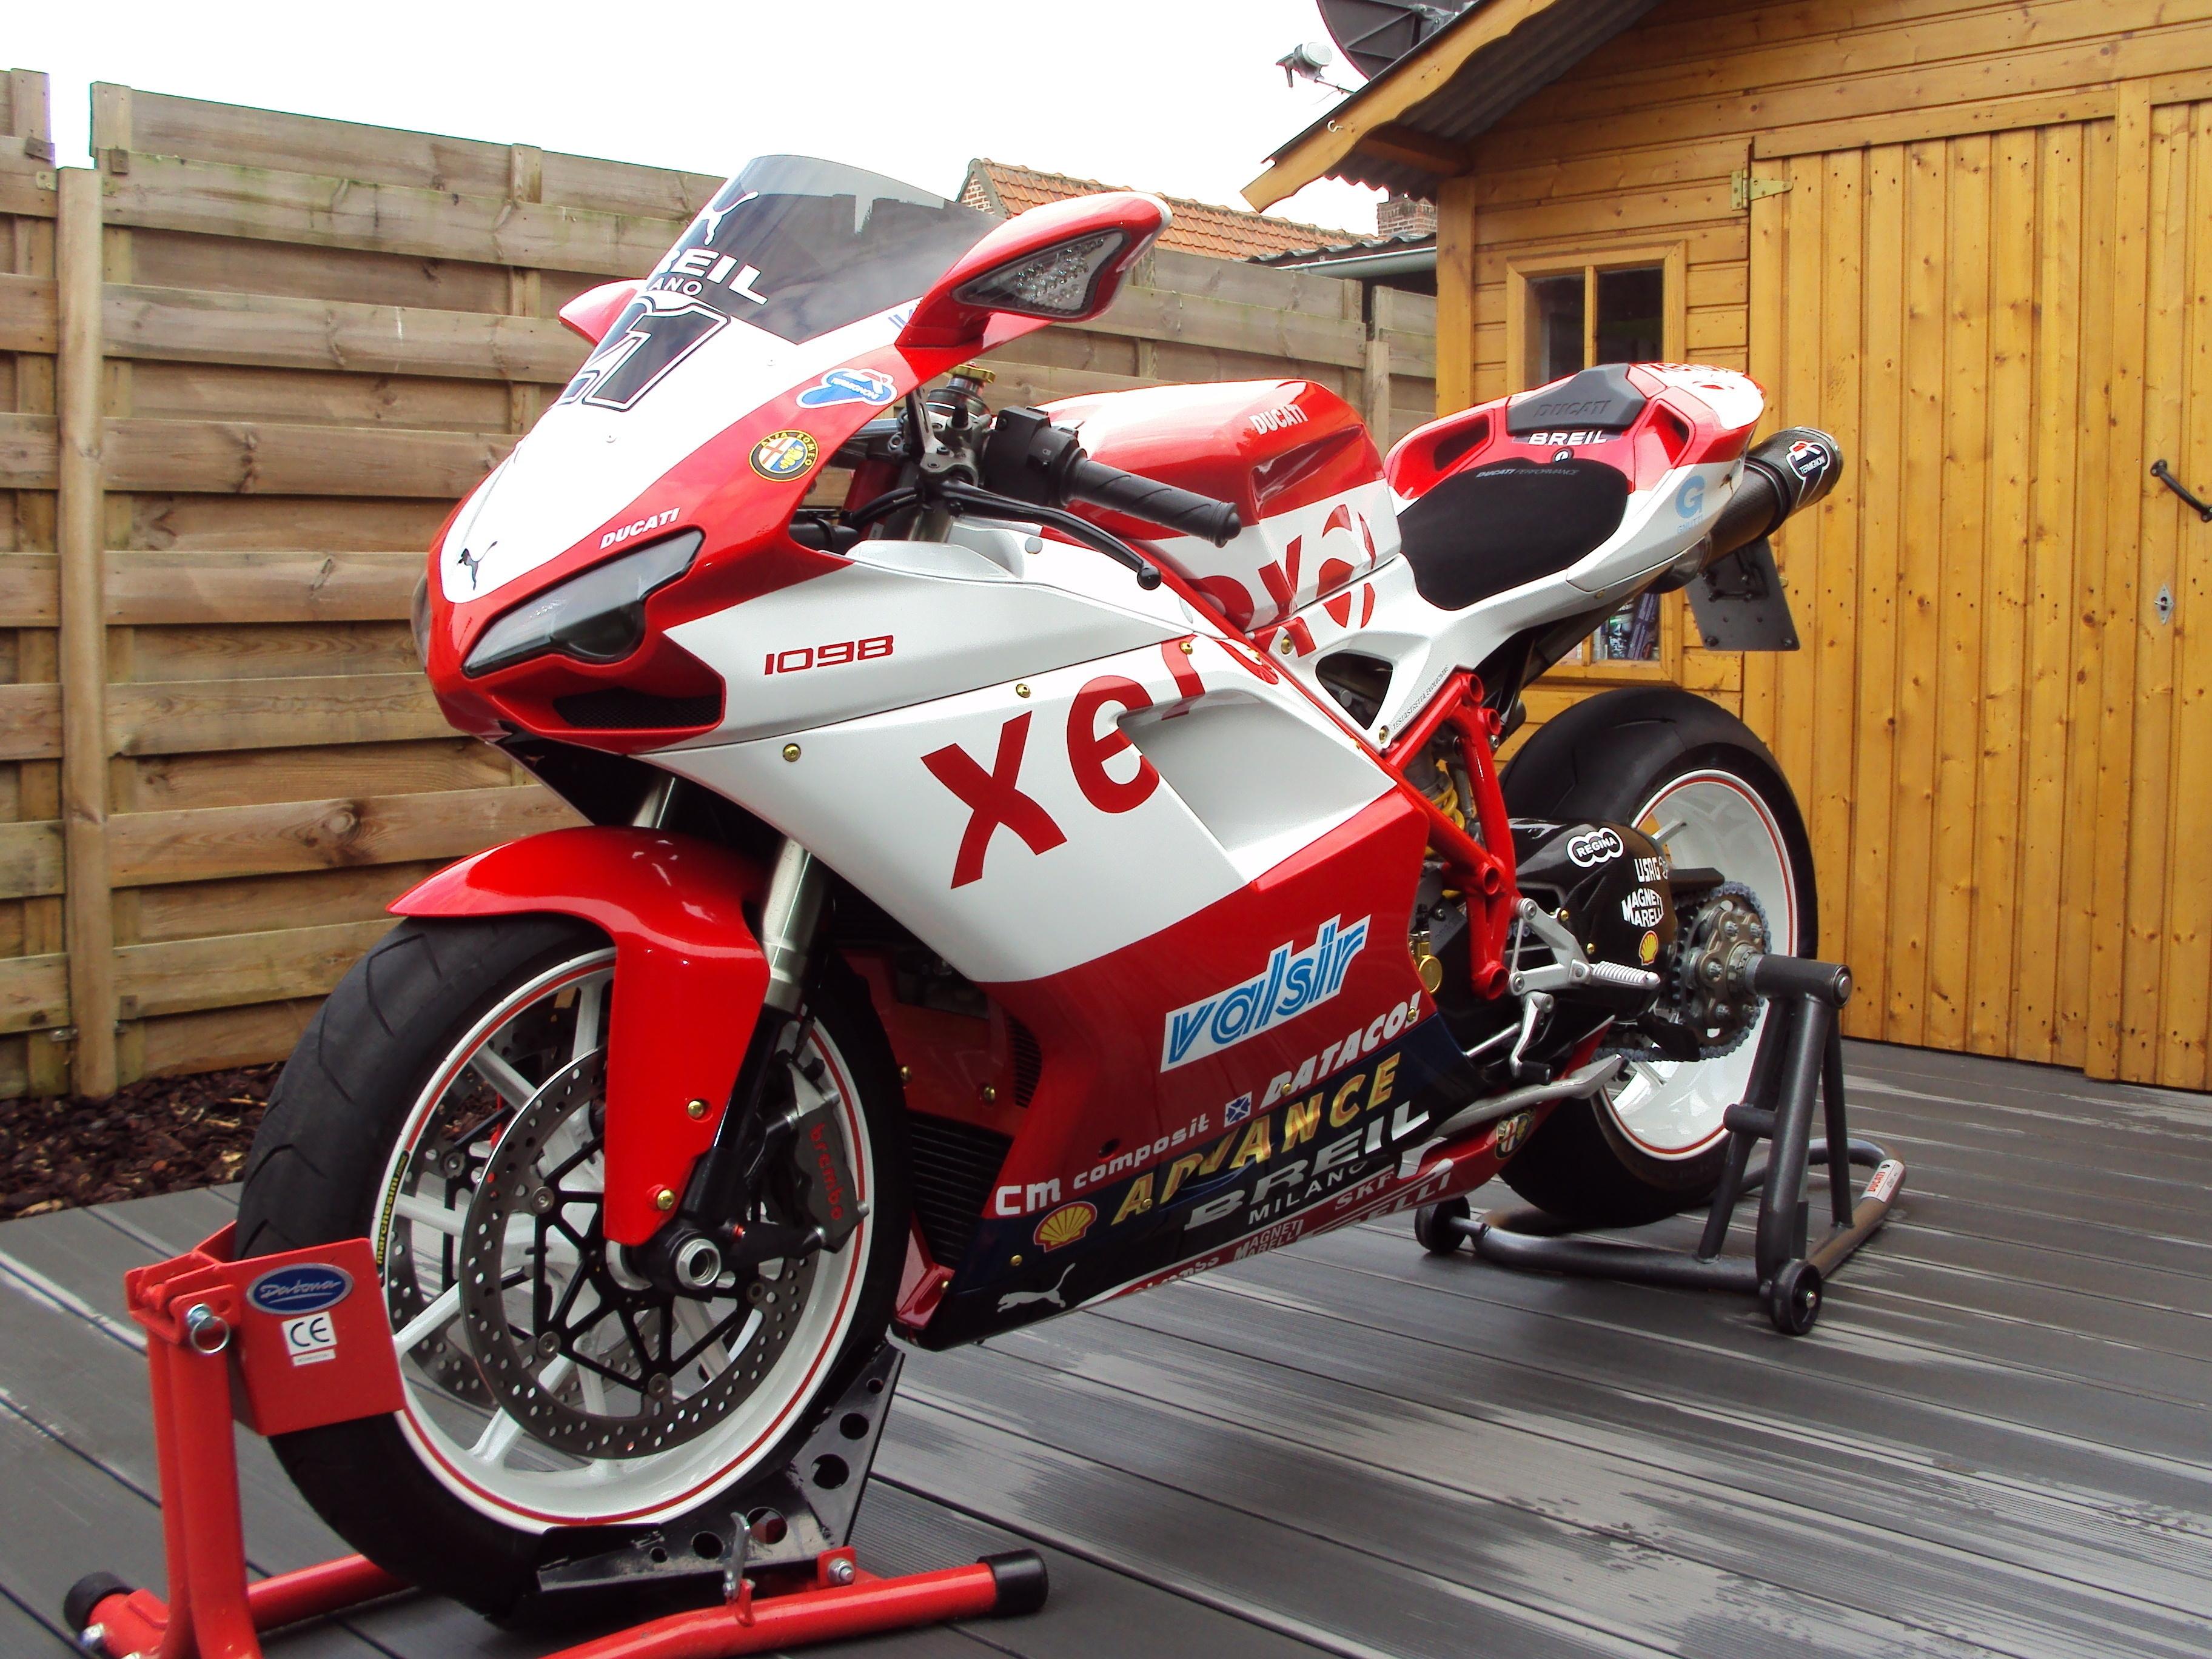 Wallpaper Sports Car Motorcycle Honda Ducati Wheel Bike